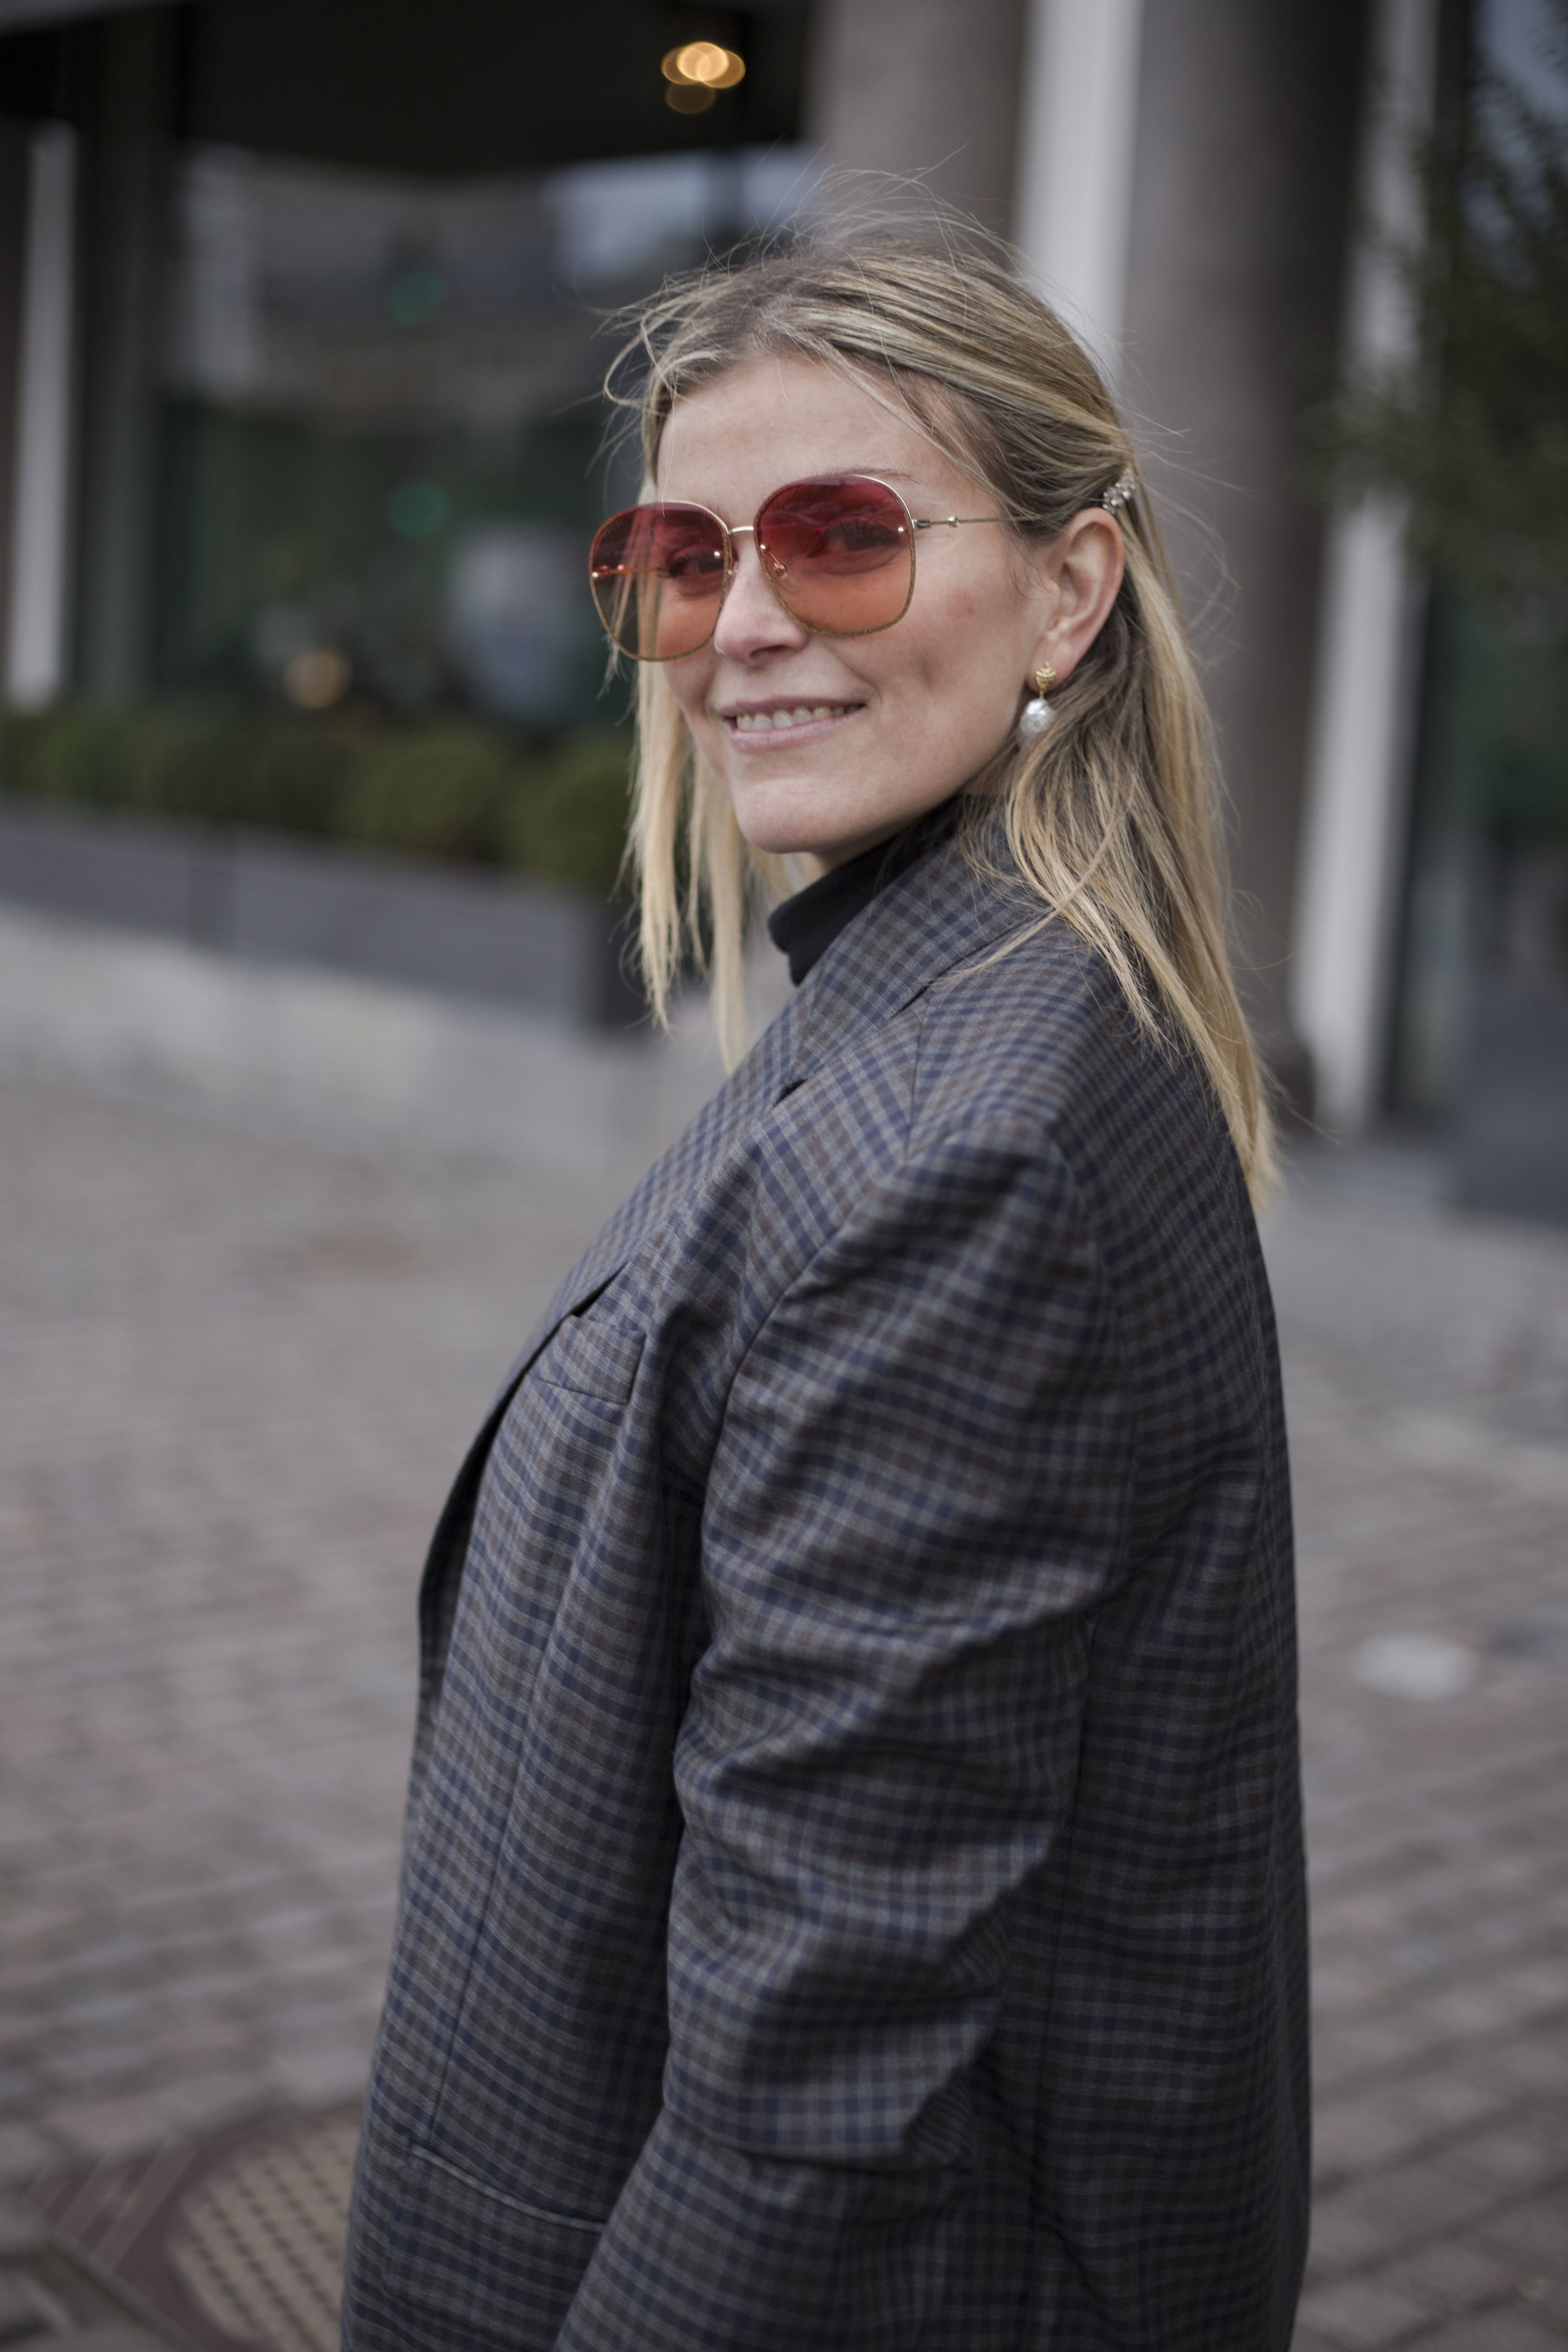 polliani-copenhagen-fashionweek-scandinavian-street-style-streetstyle-thestreetland-fashion-best-style.jpg